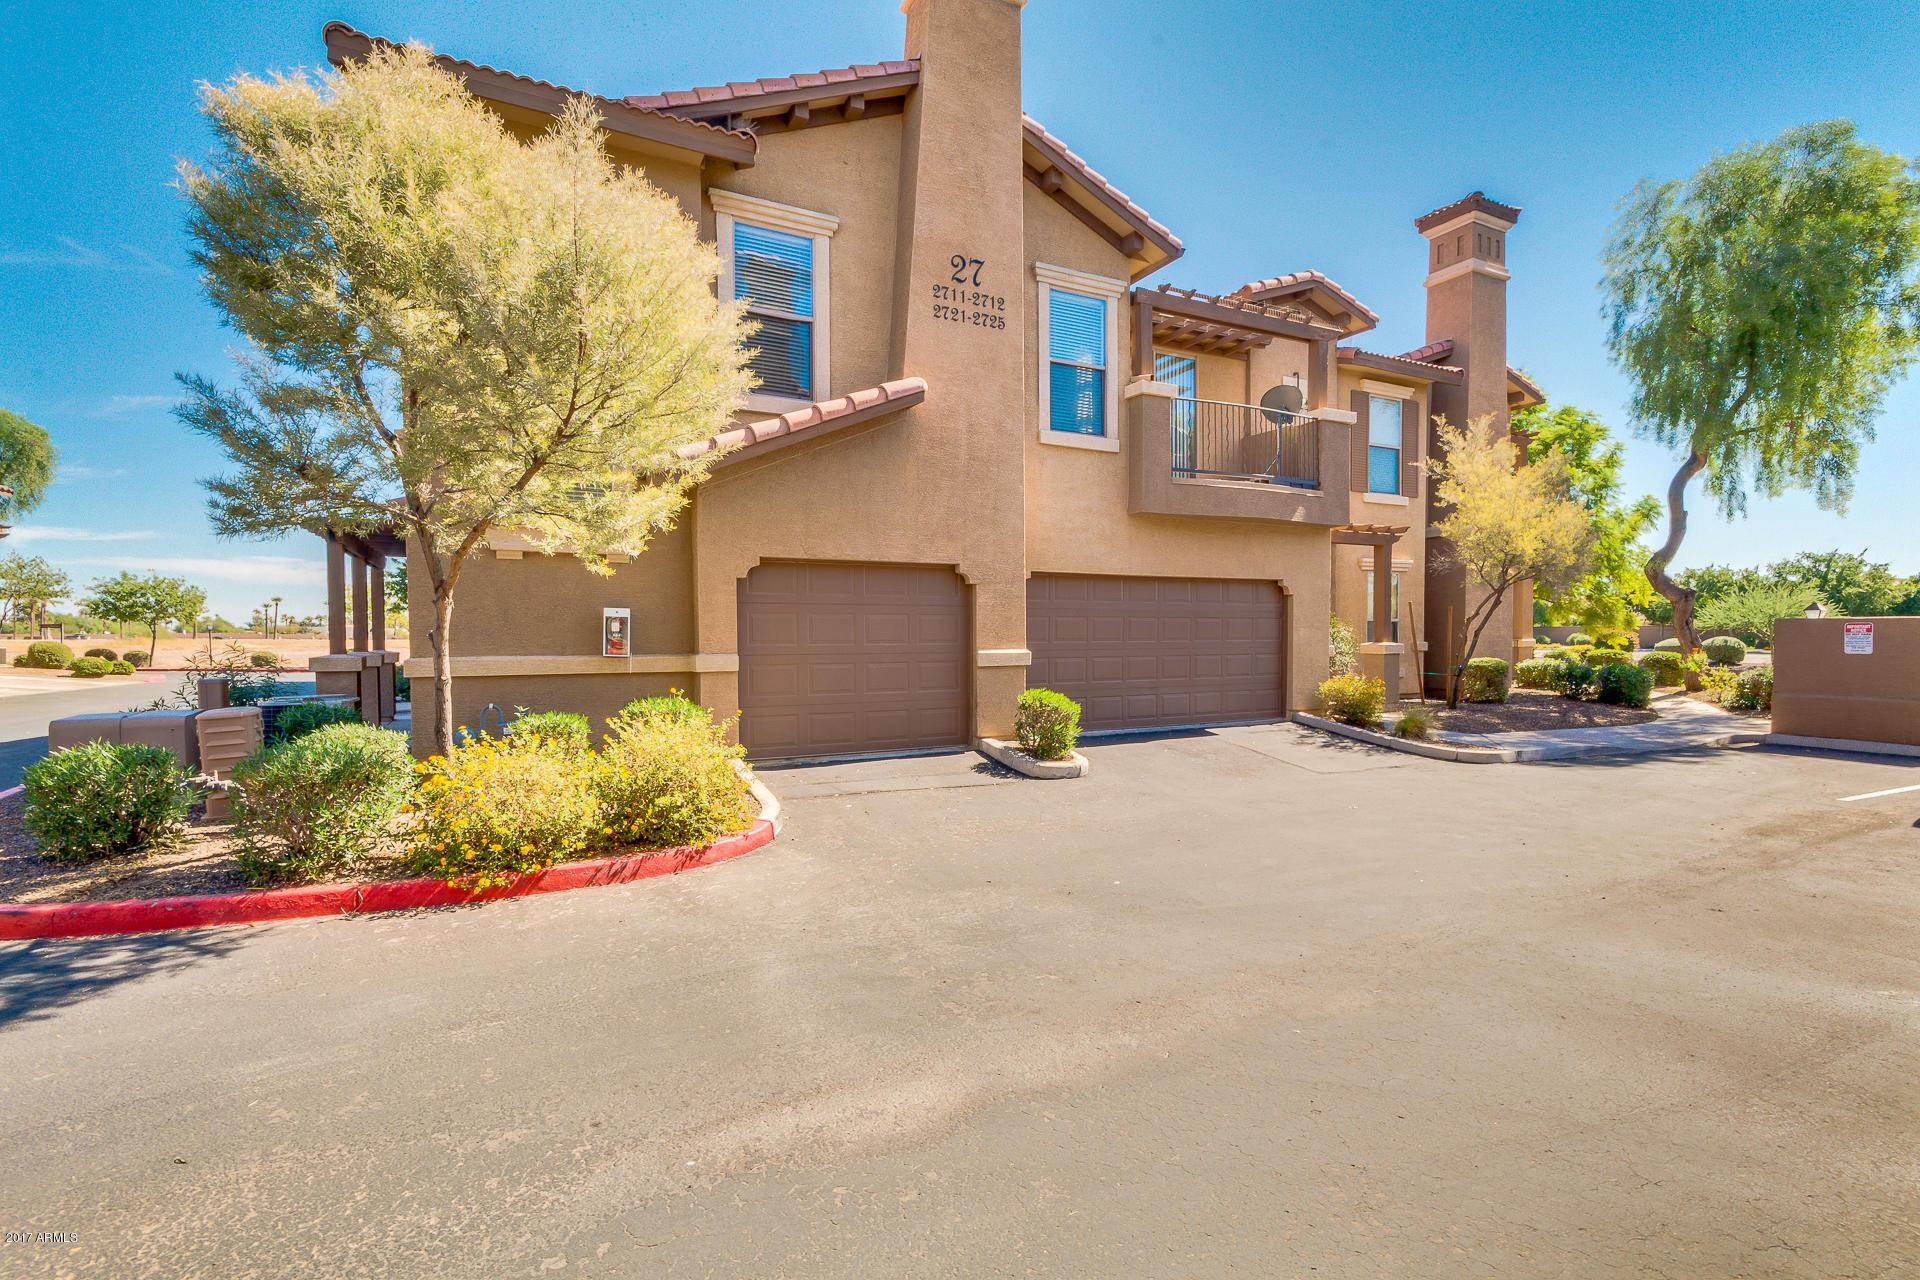 14250 W Wigwam Boulevard, Unit 2721, Litchfield Park AZ 85340